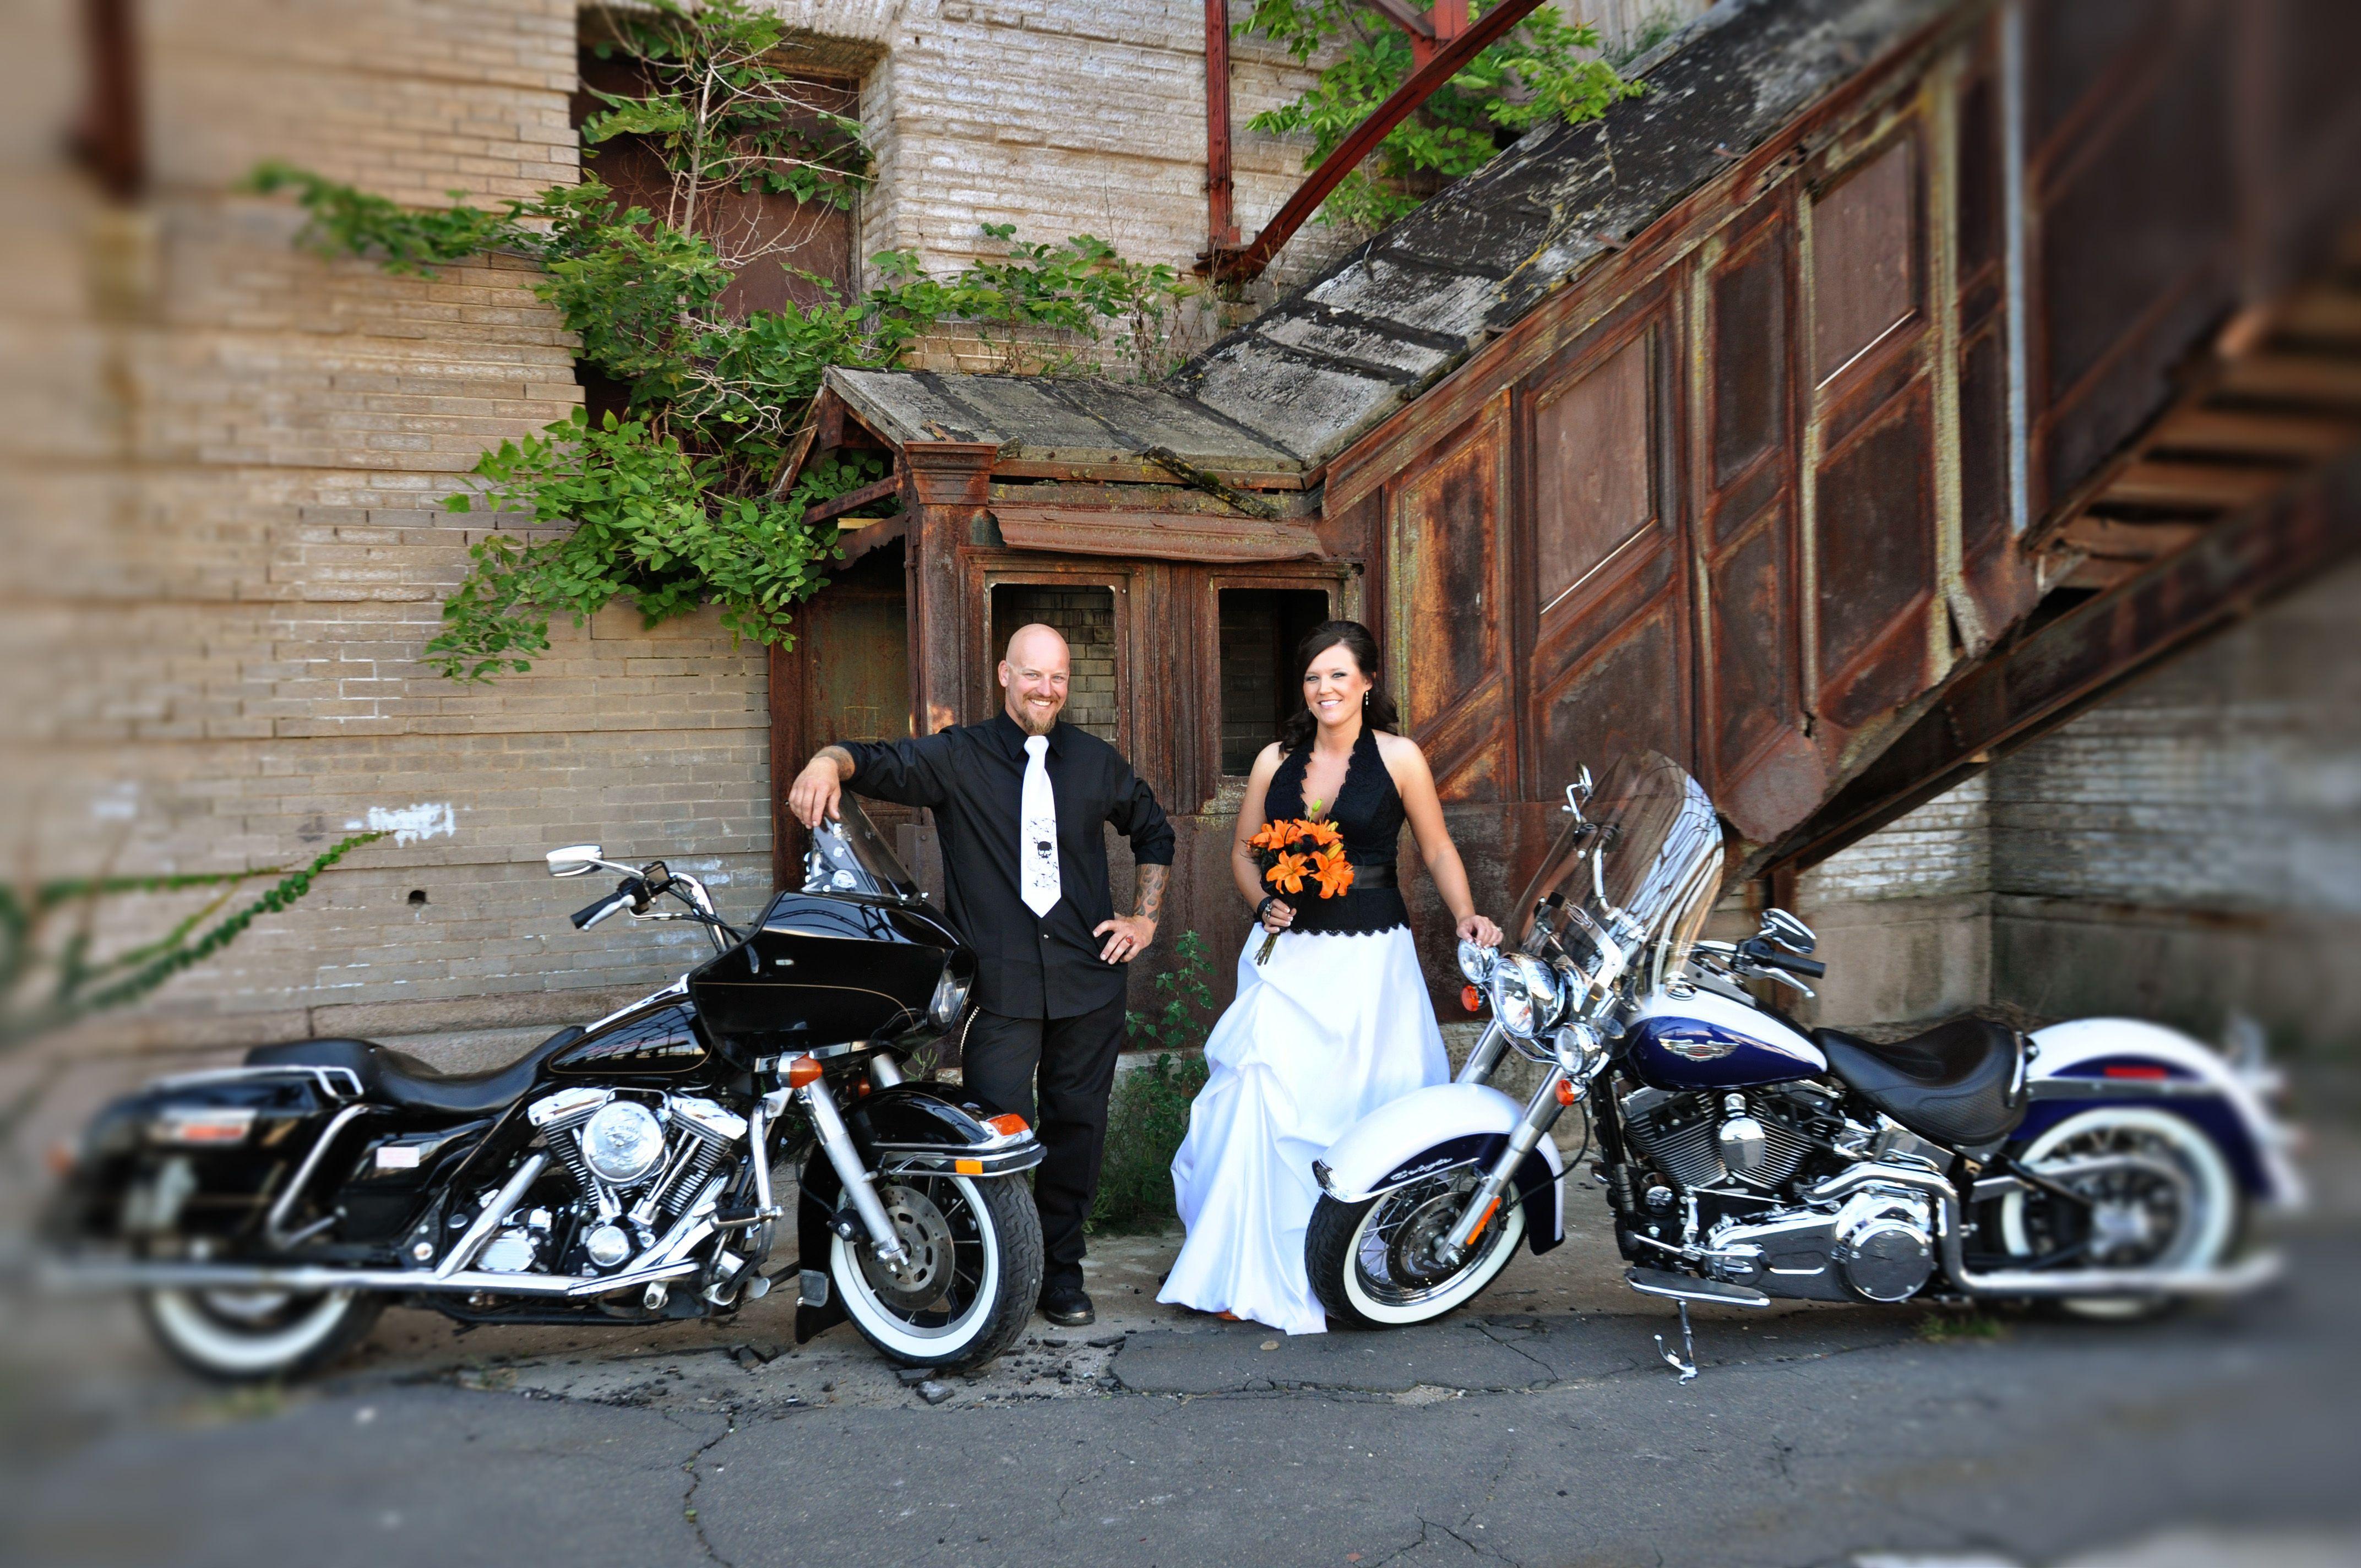 harley davidson wedding rings harley davidson wedding Our Harley Davidson Wedding Part 1 Harleys and Heels